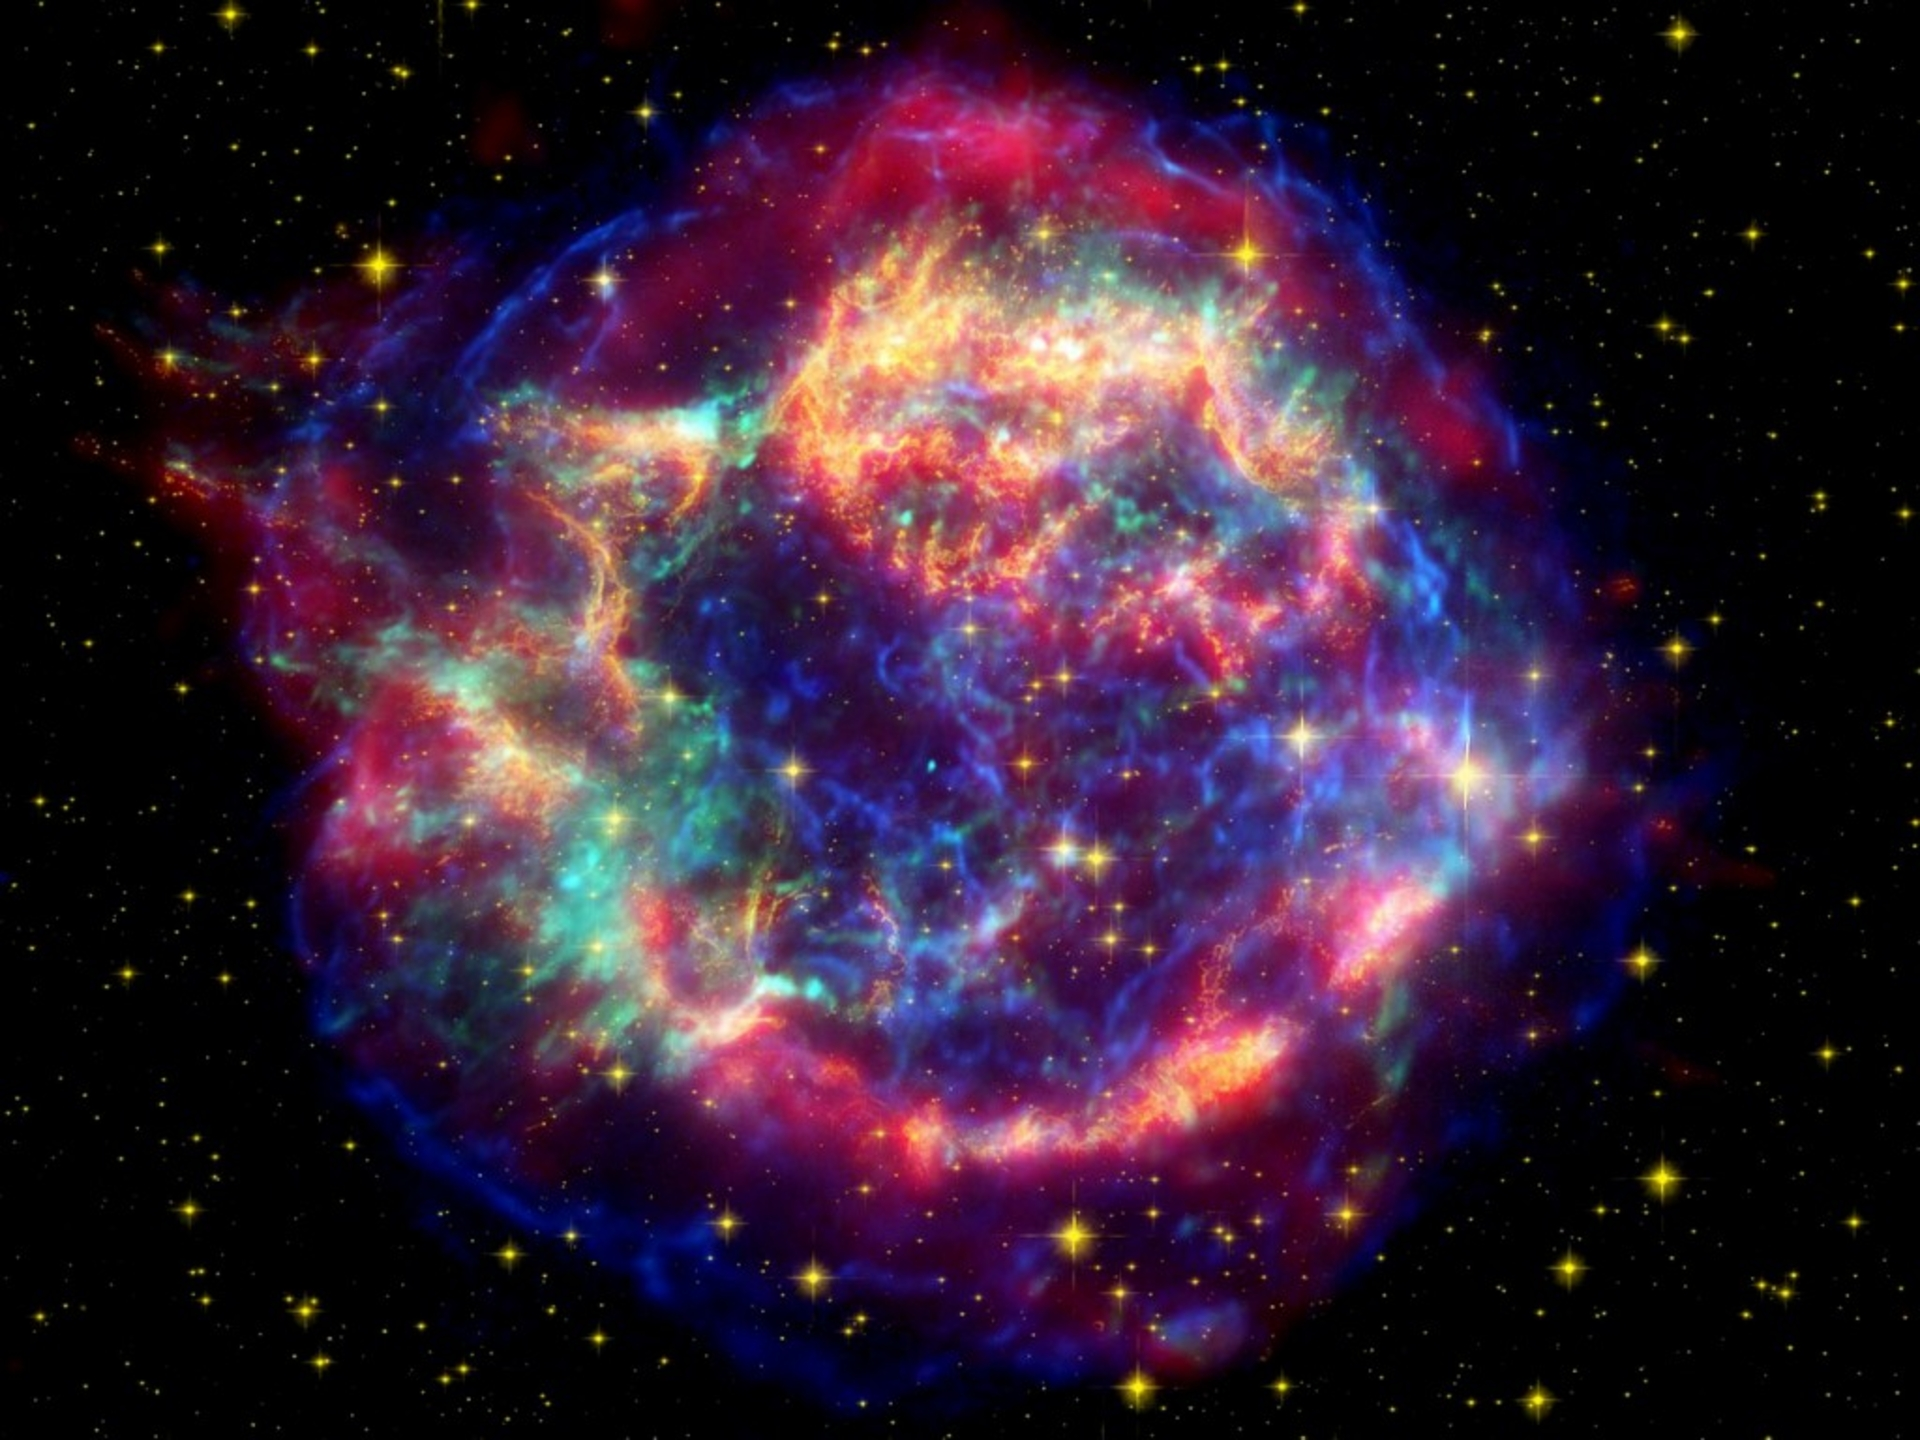 Supernova Explosion Wallpaper 1920x1440